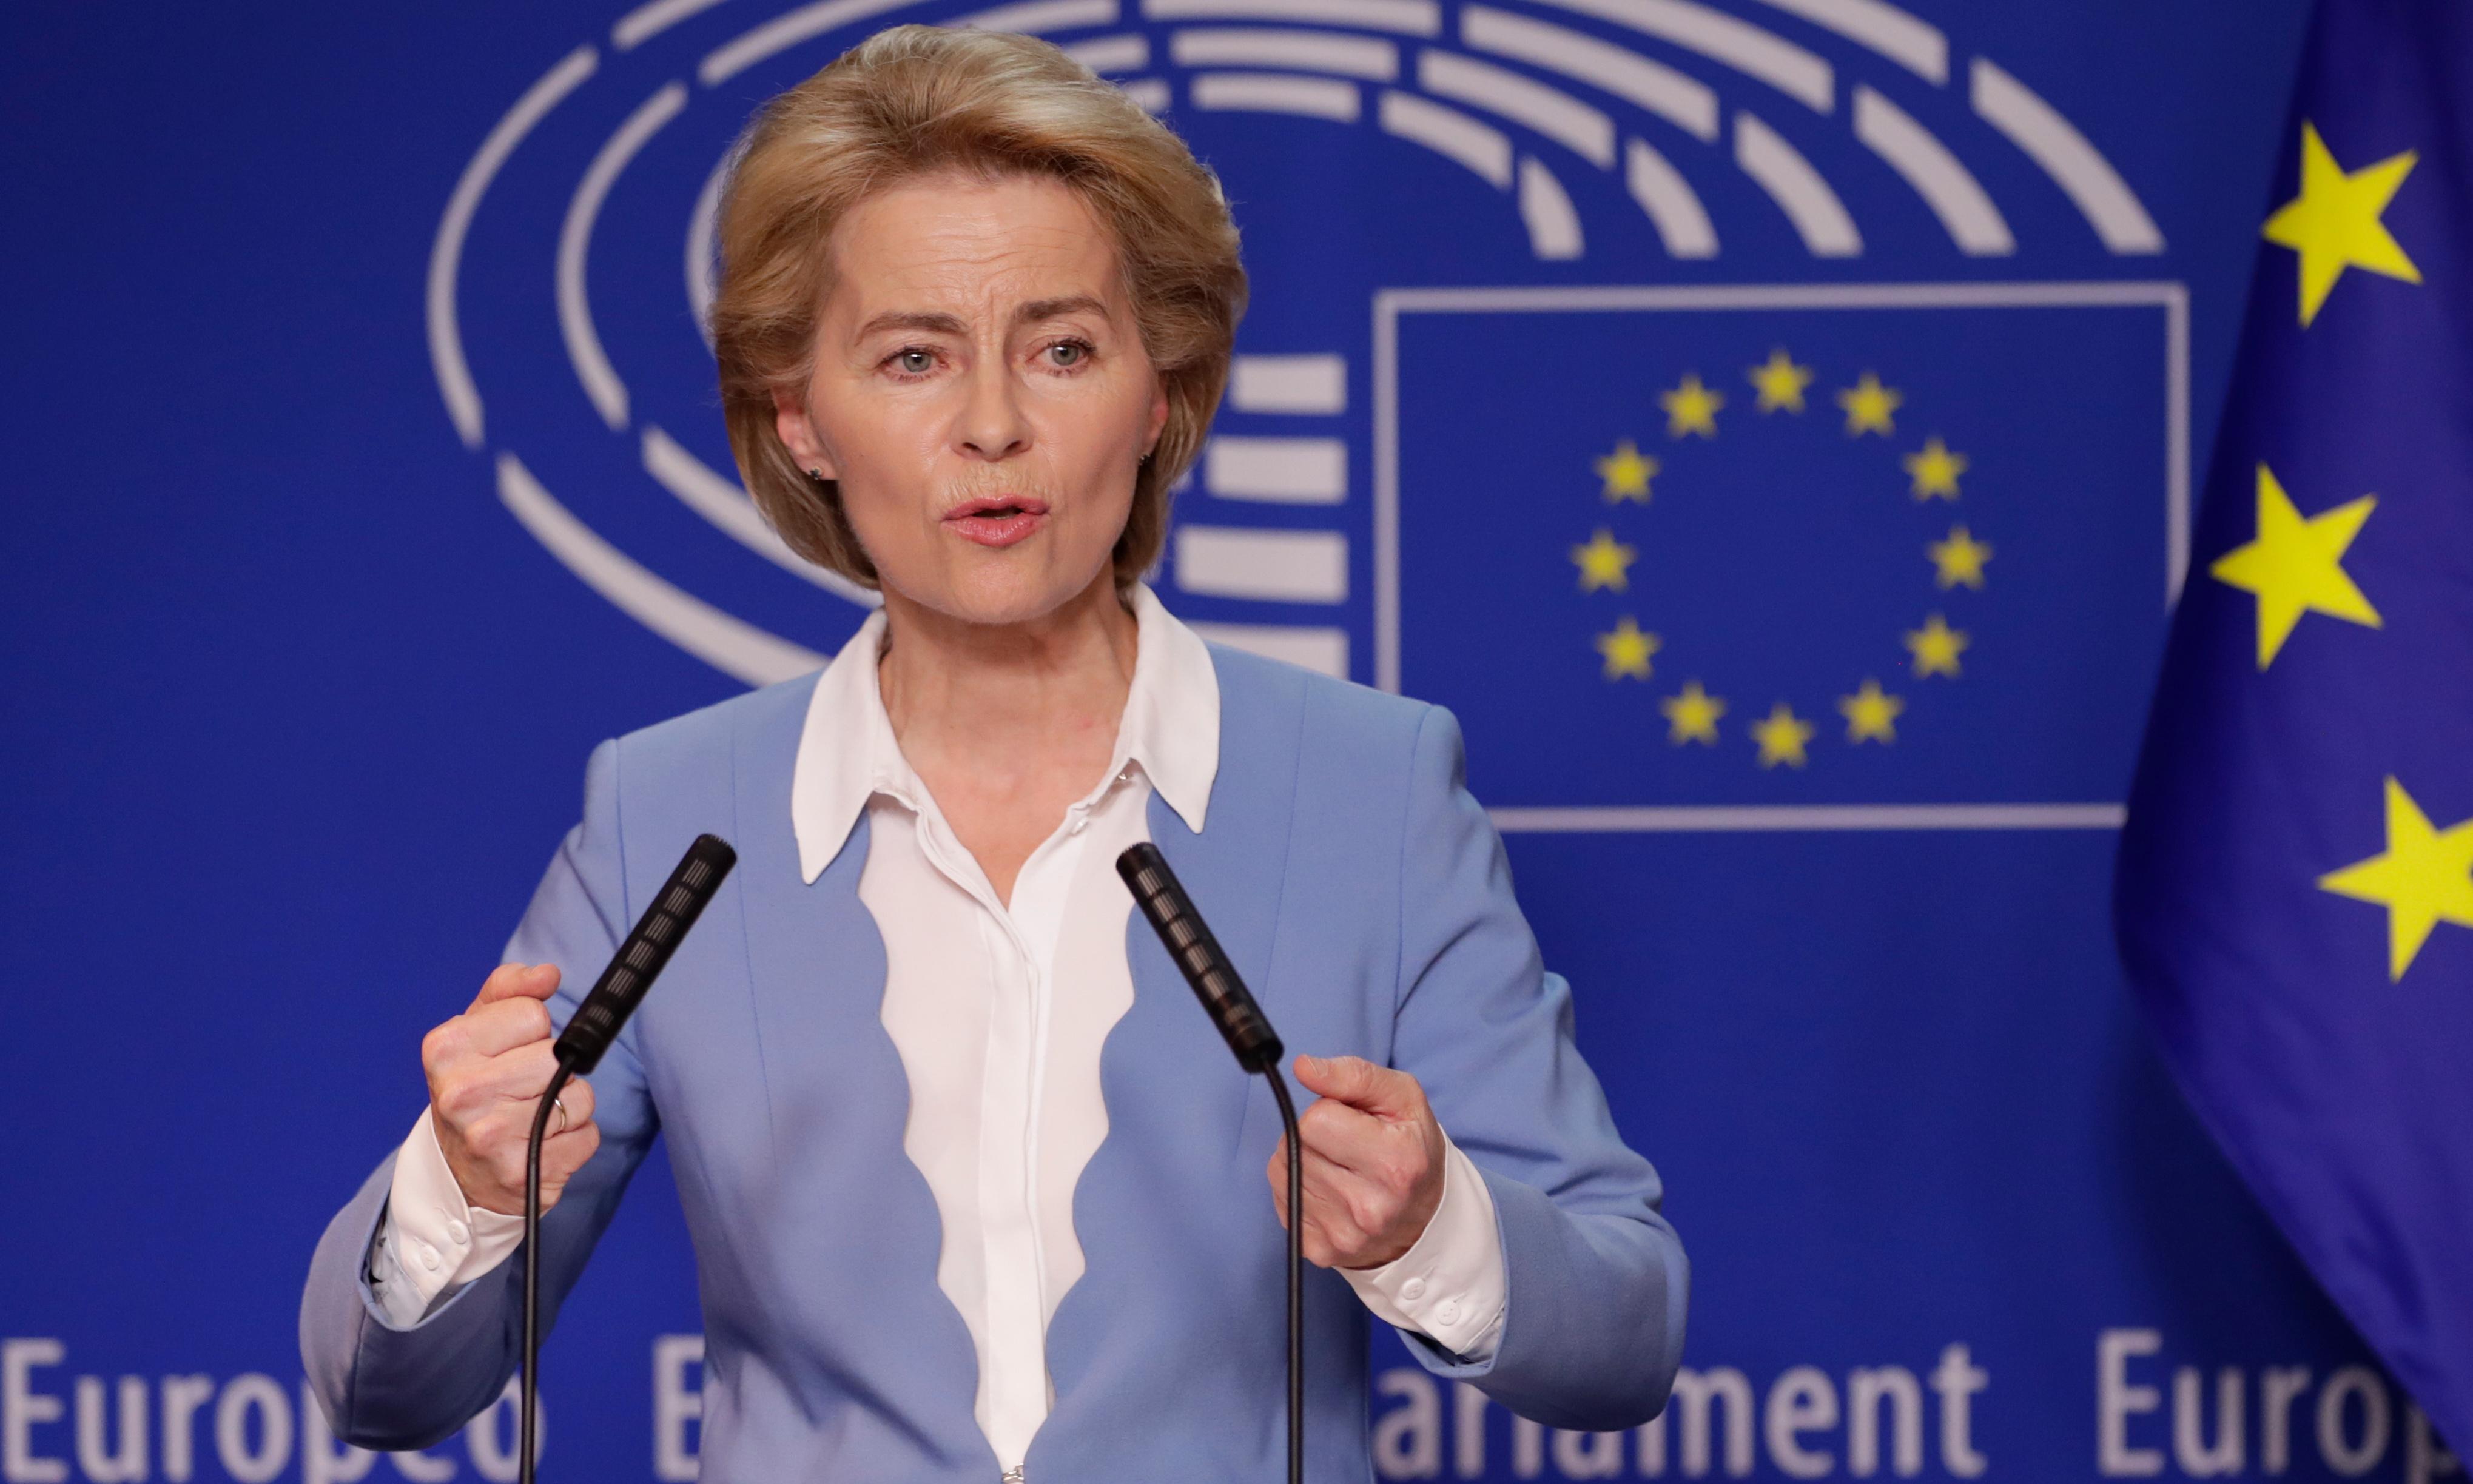 Ursula von der Leyen makes final pledges to secure EU's top job